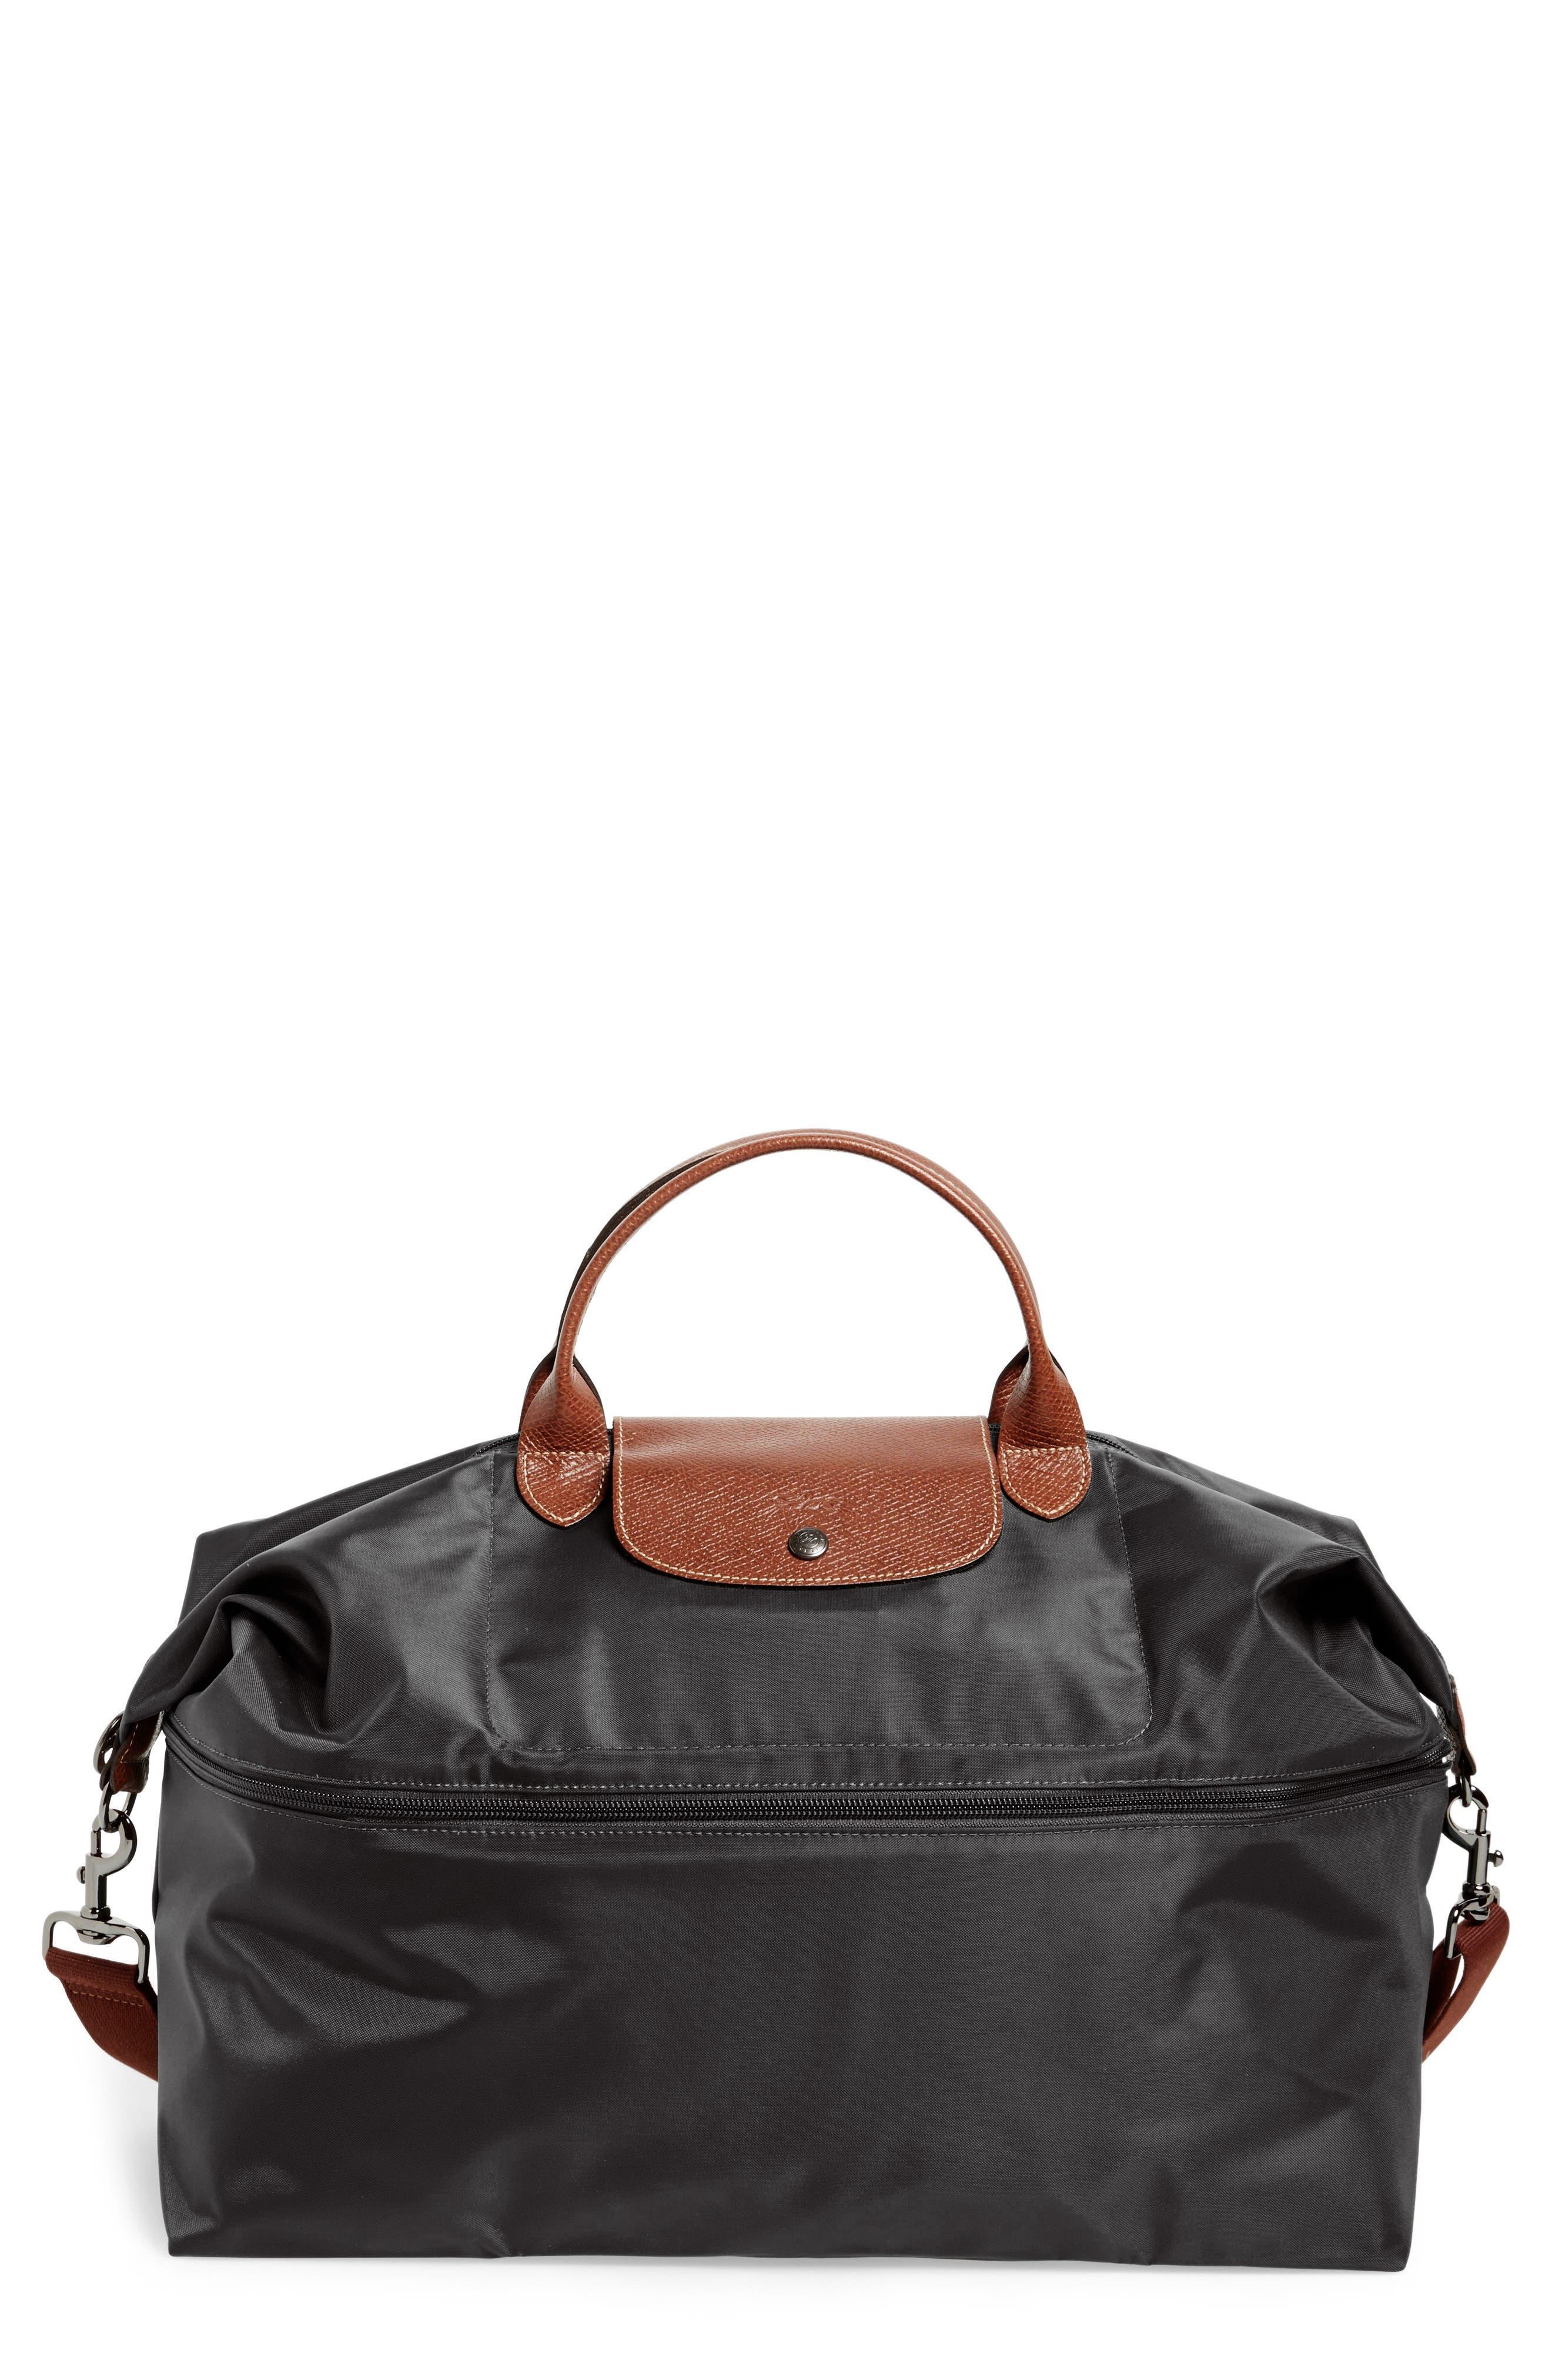 2bdea3cc765ab Handbags & Wallets for Women | Nordstrom